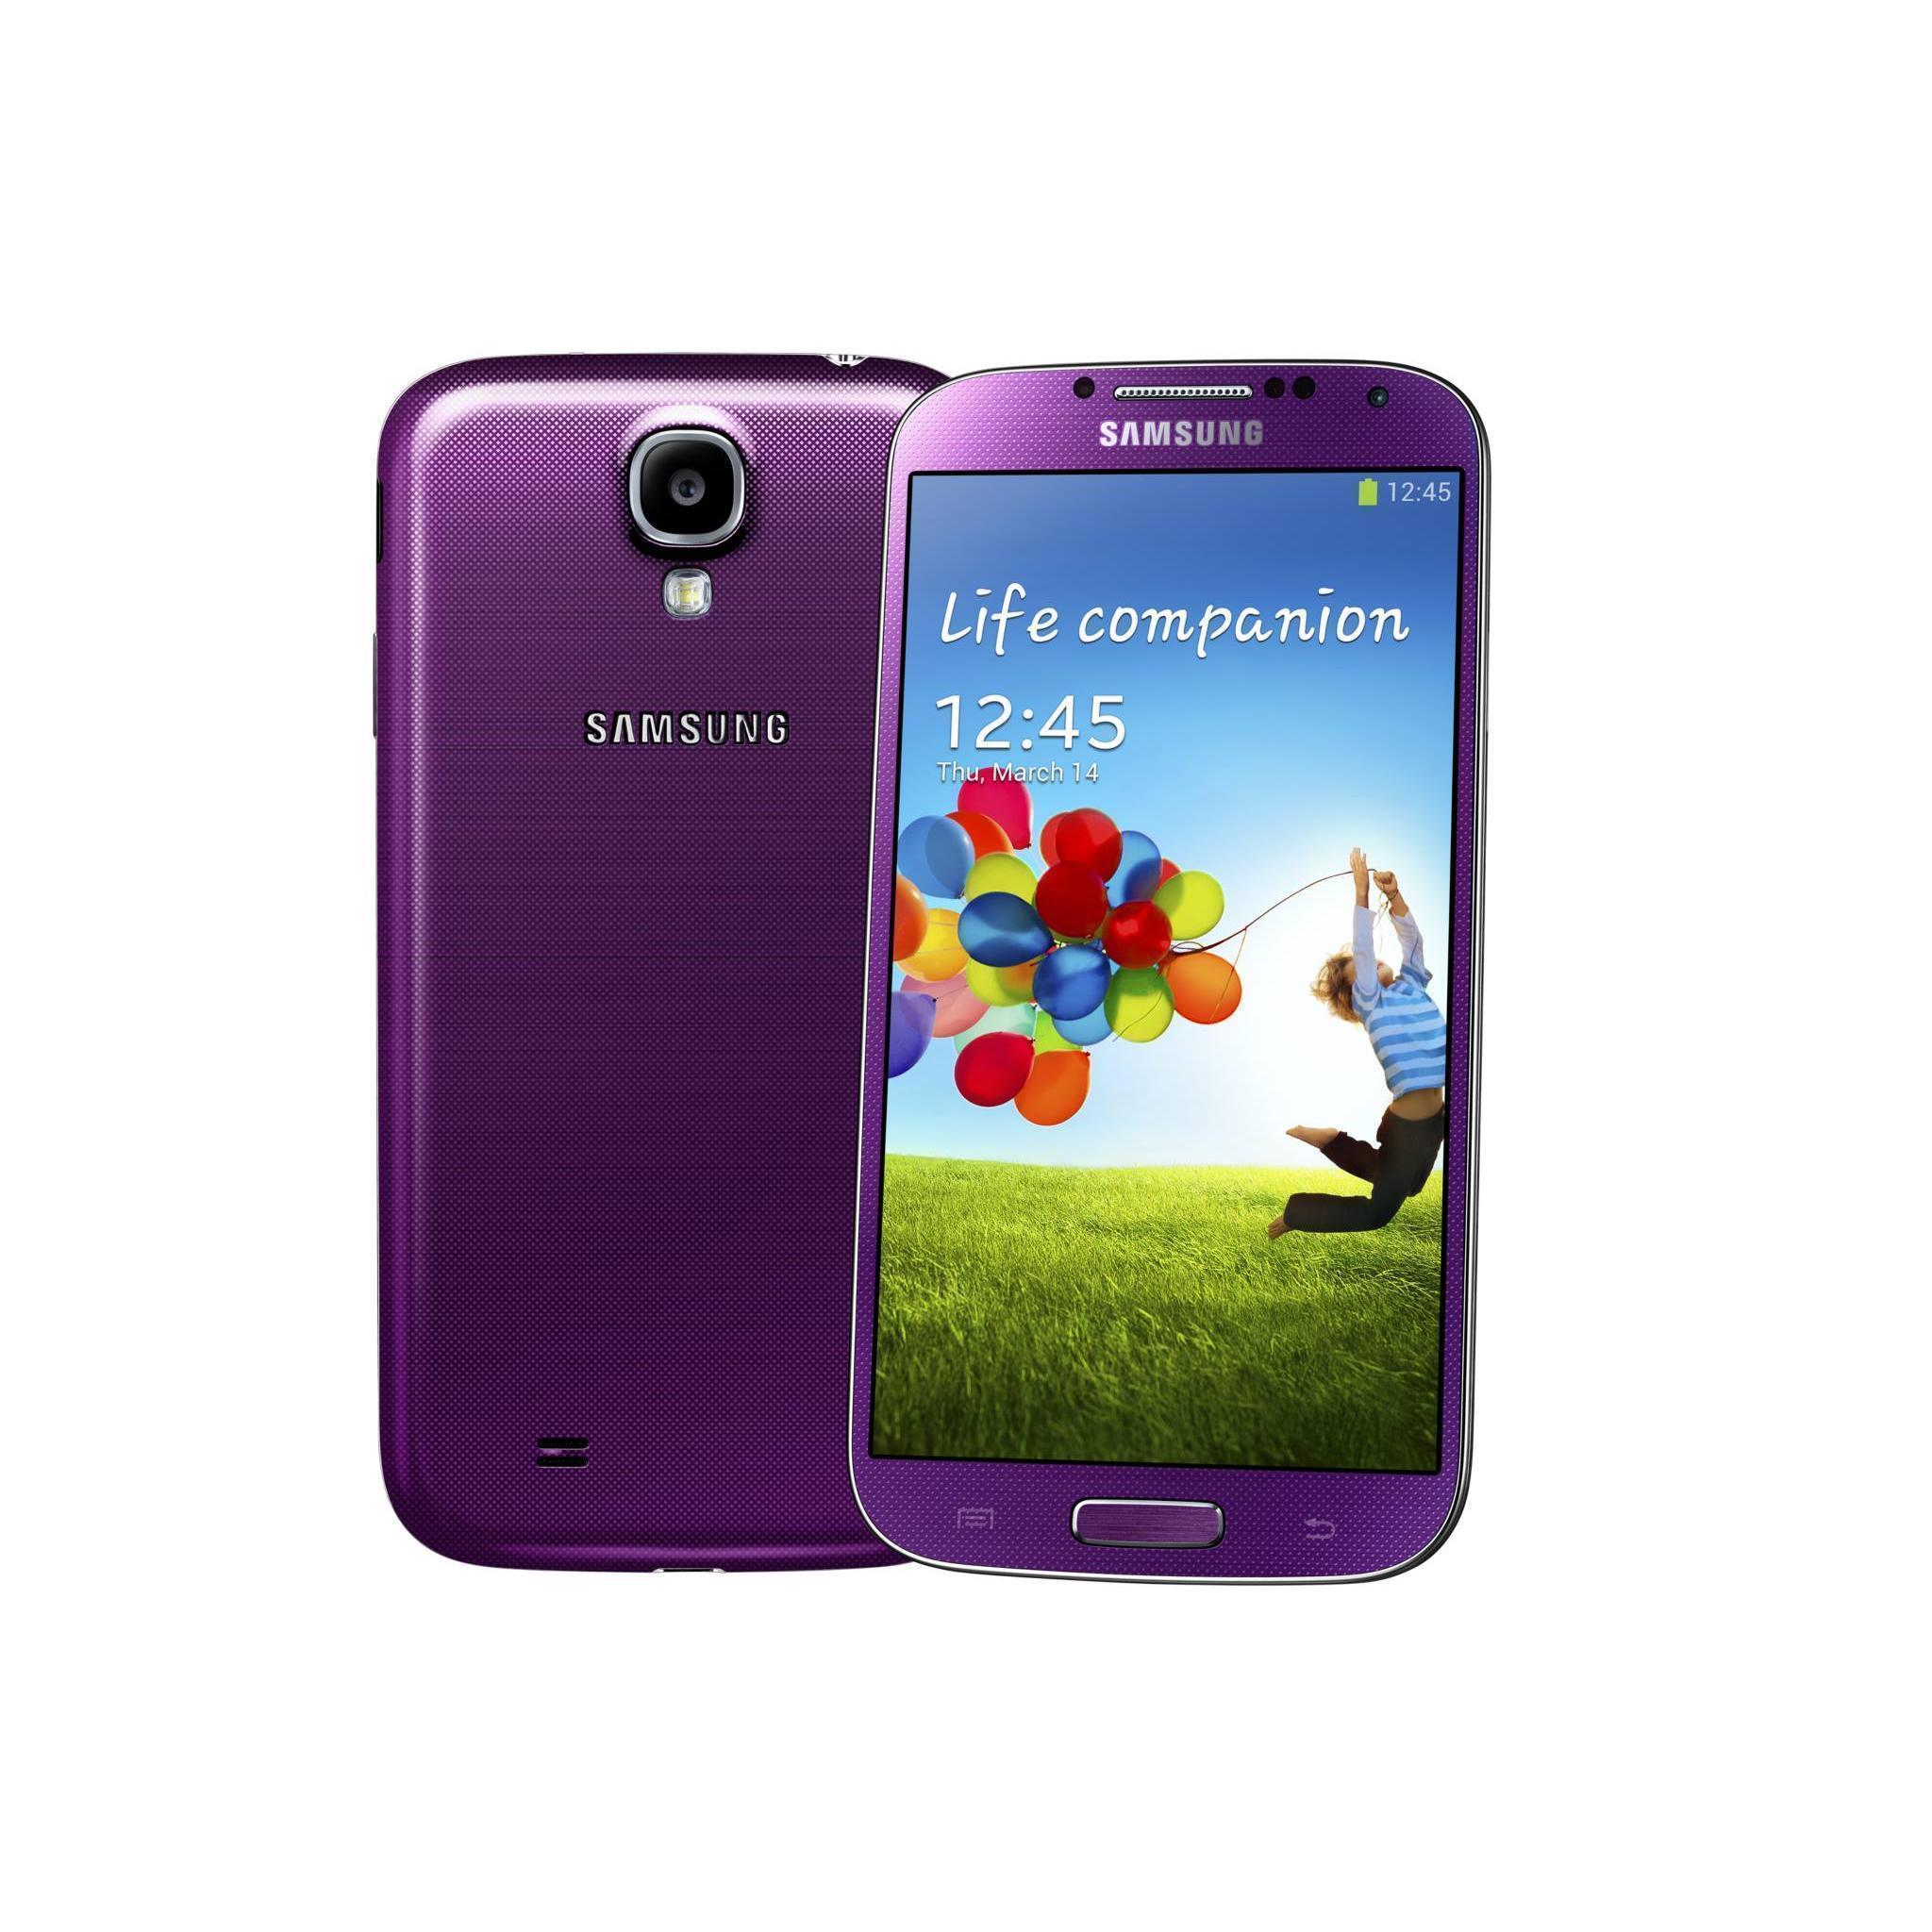 Samsung Galaxy S4 16 Go i9505 4G - Violet - Débloqué